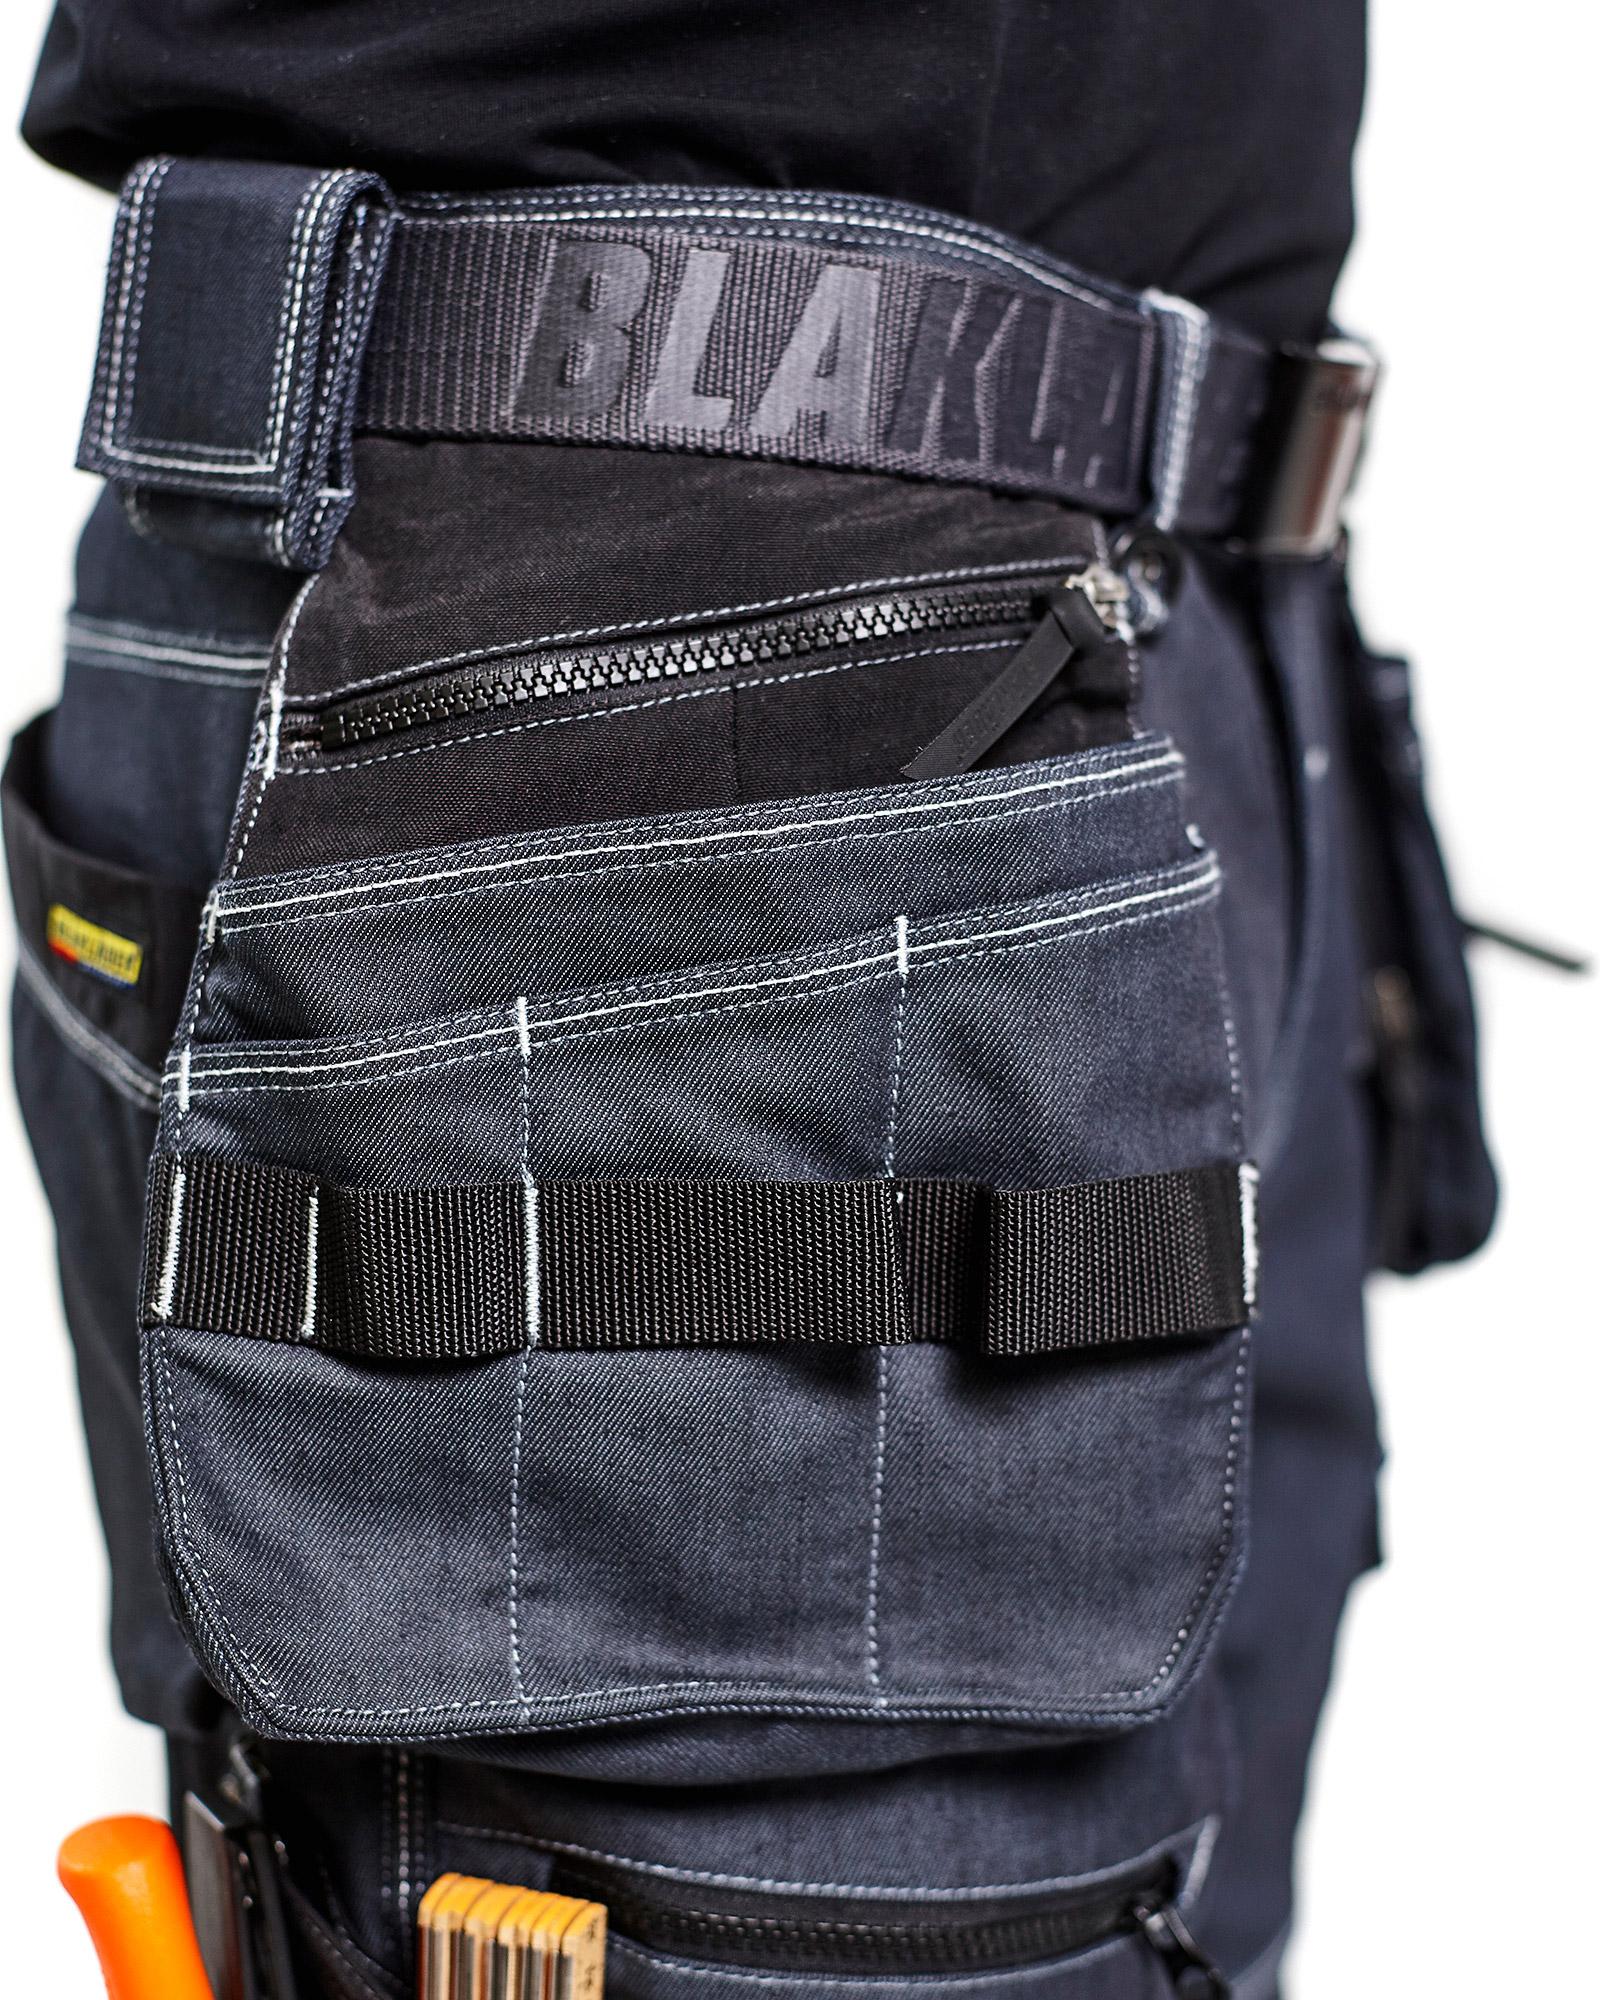 Pirate Shorts stretch X1900 (19911141) - Blaklader 4881daffa66fa